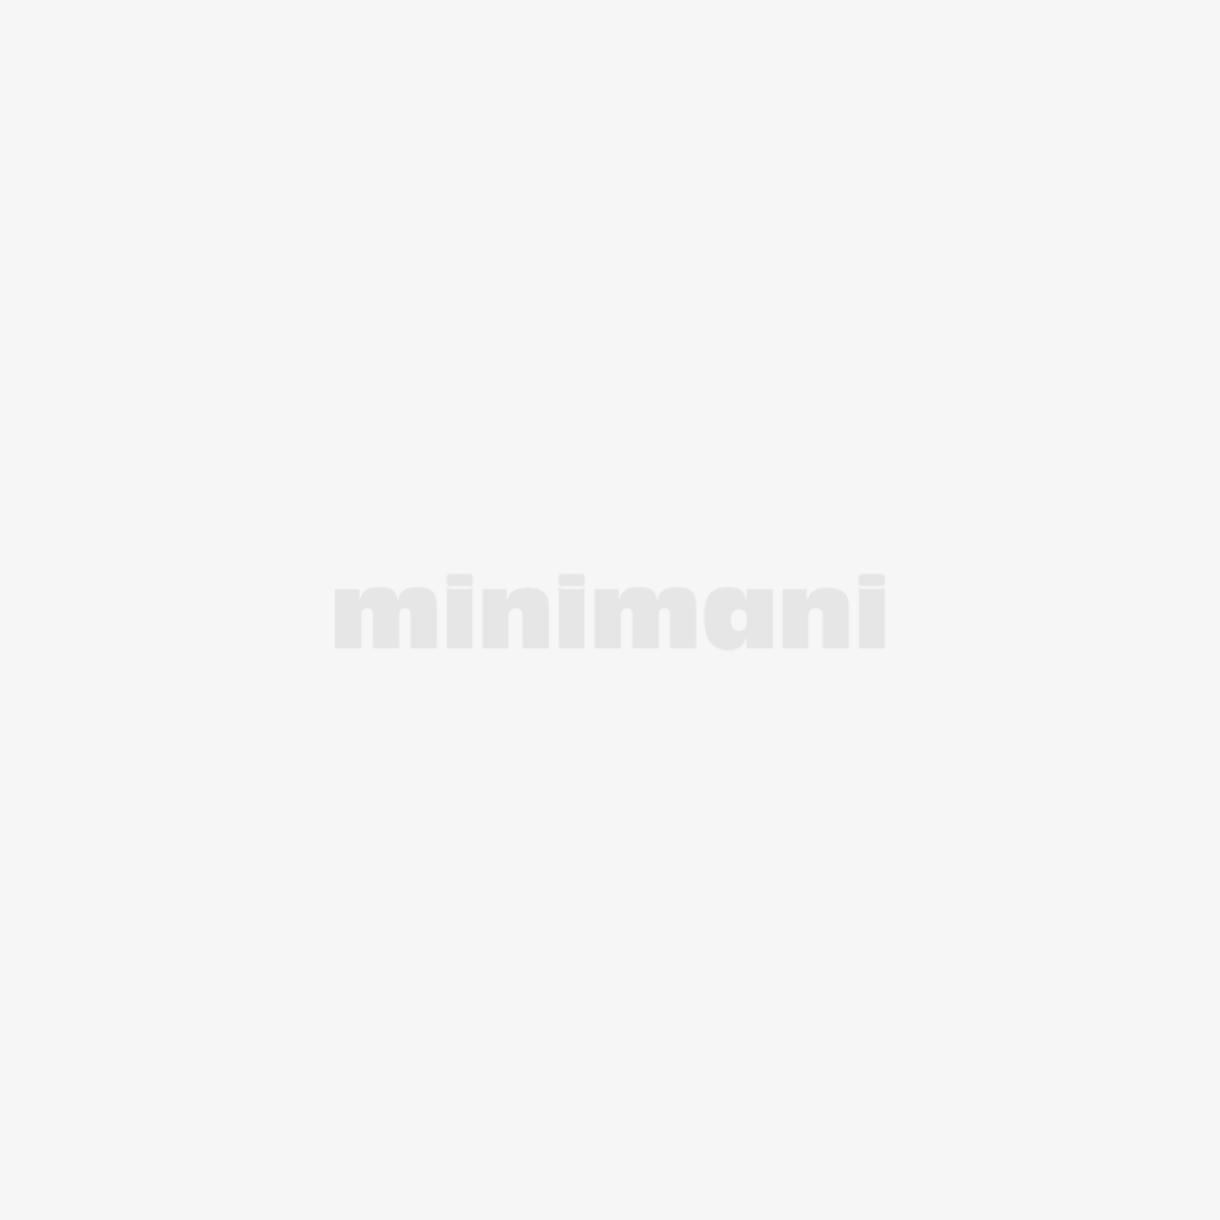 HEIROL PIIRASVUOKA12 CM, PINNOITETTU 12 CM, 0,3 MM